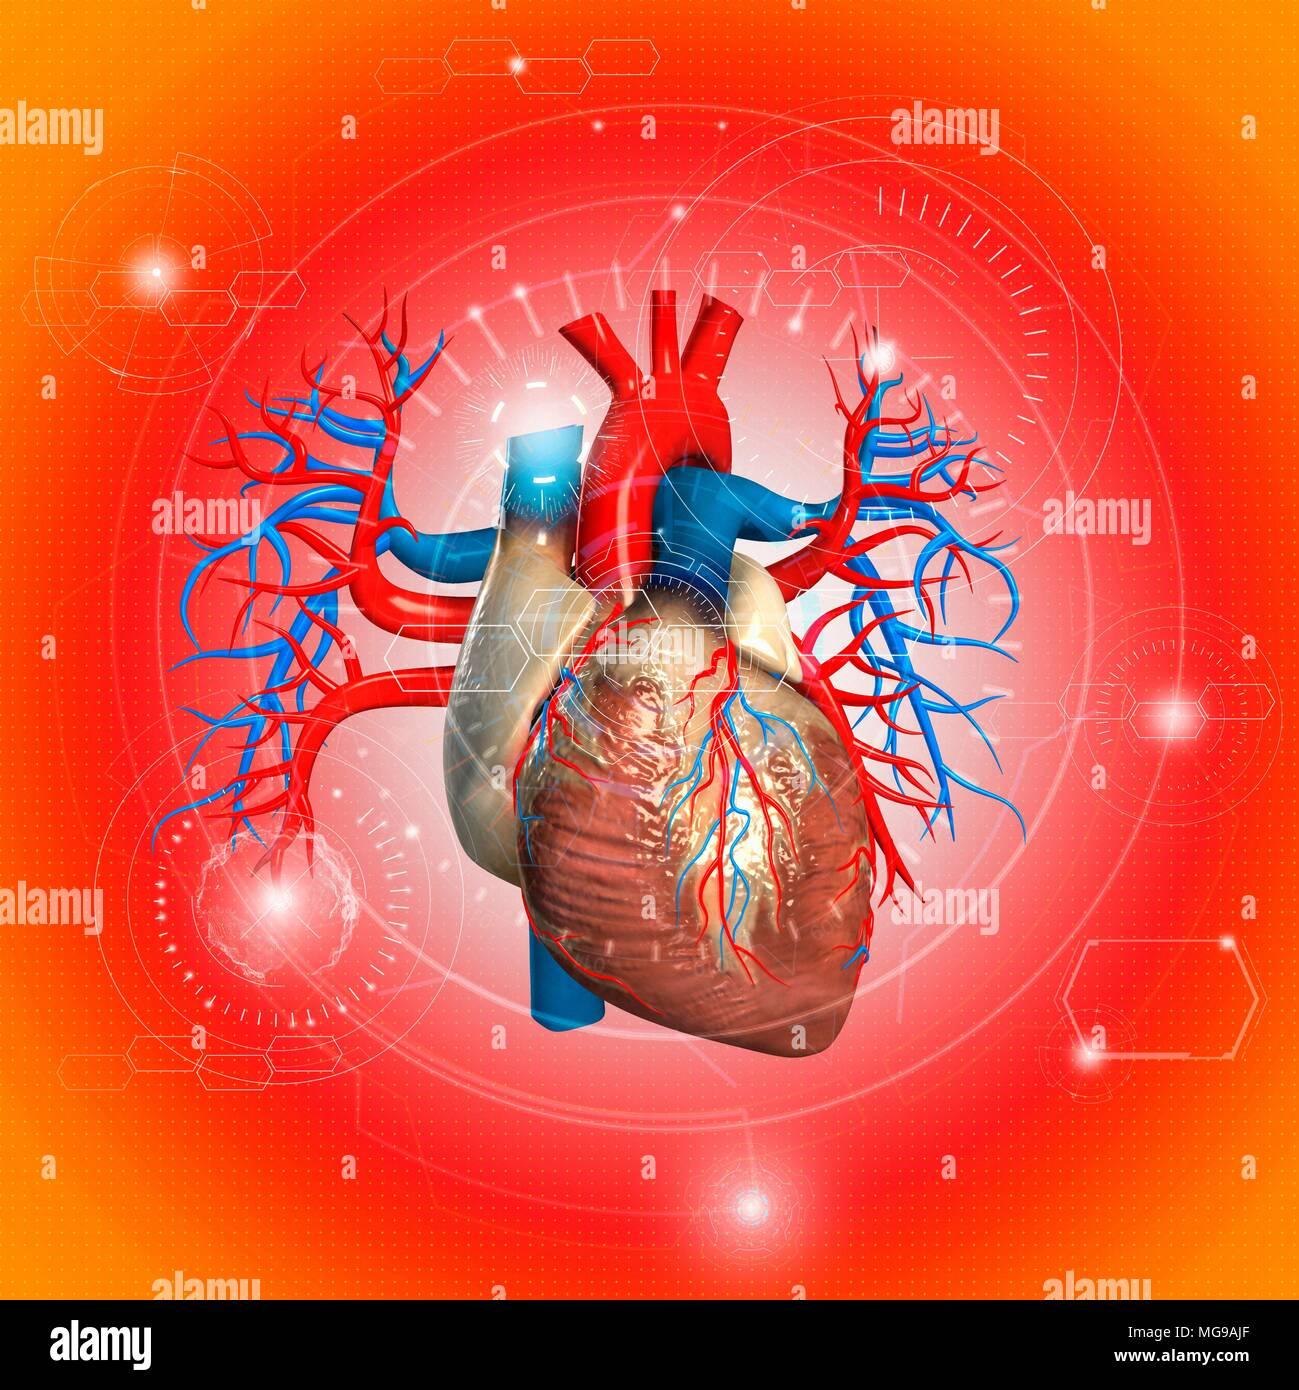 Human heart, illustration. - Stock Image